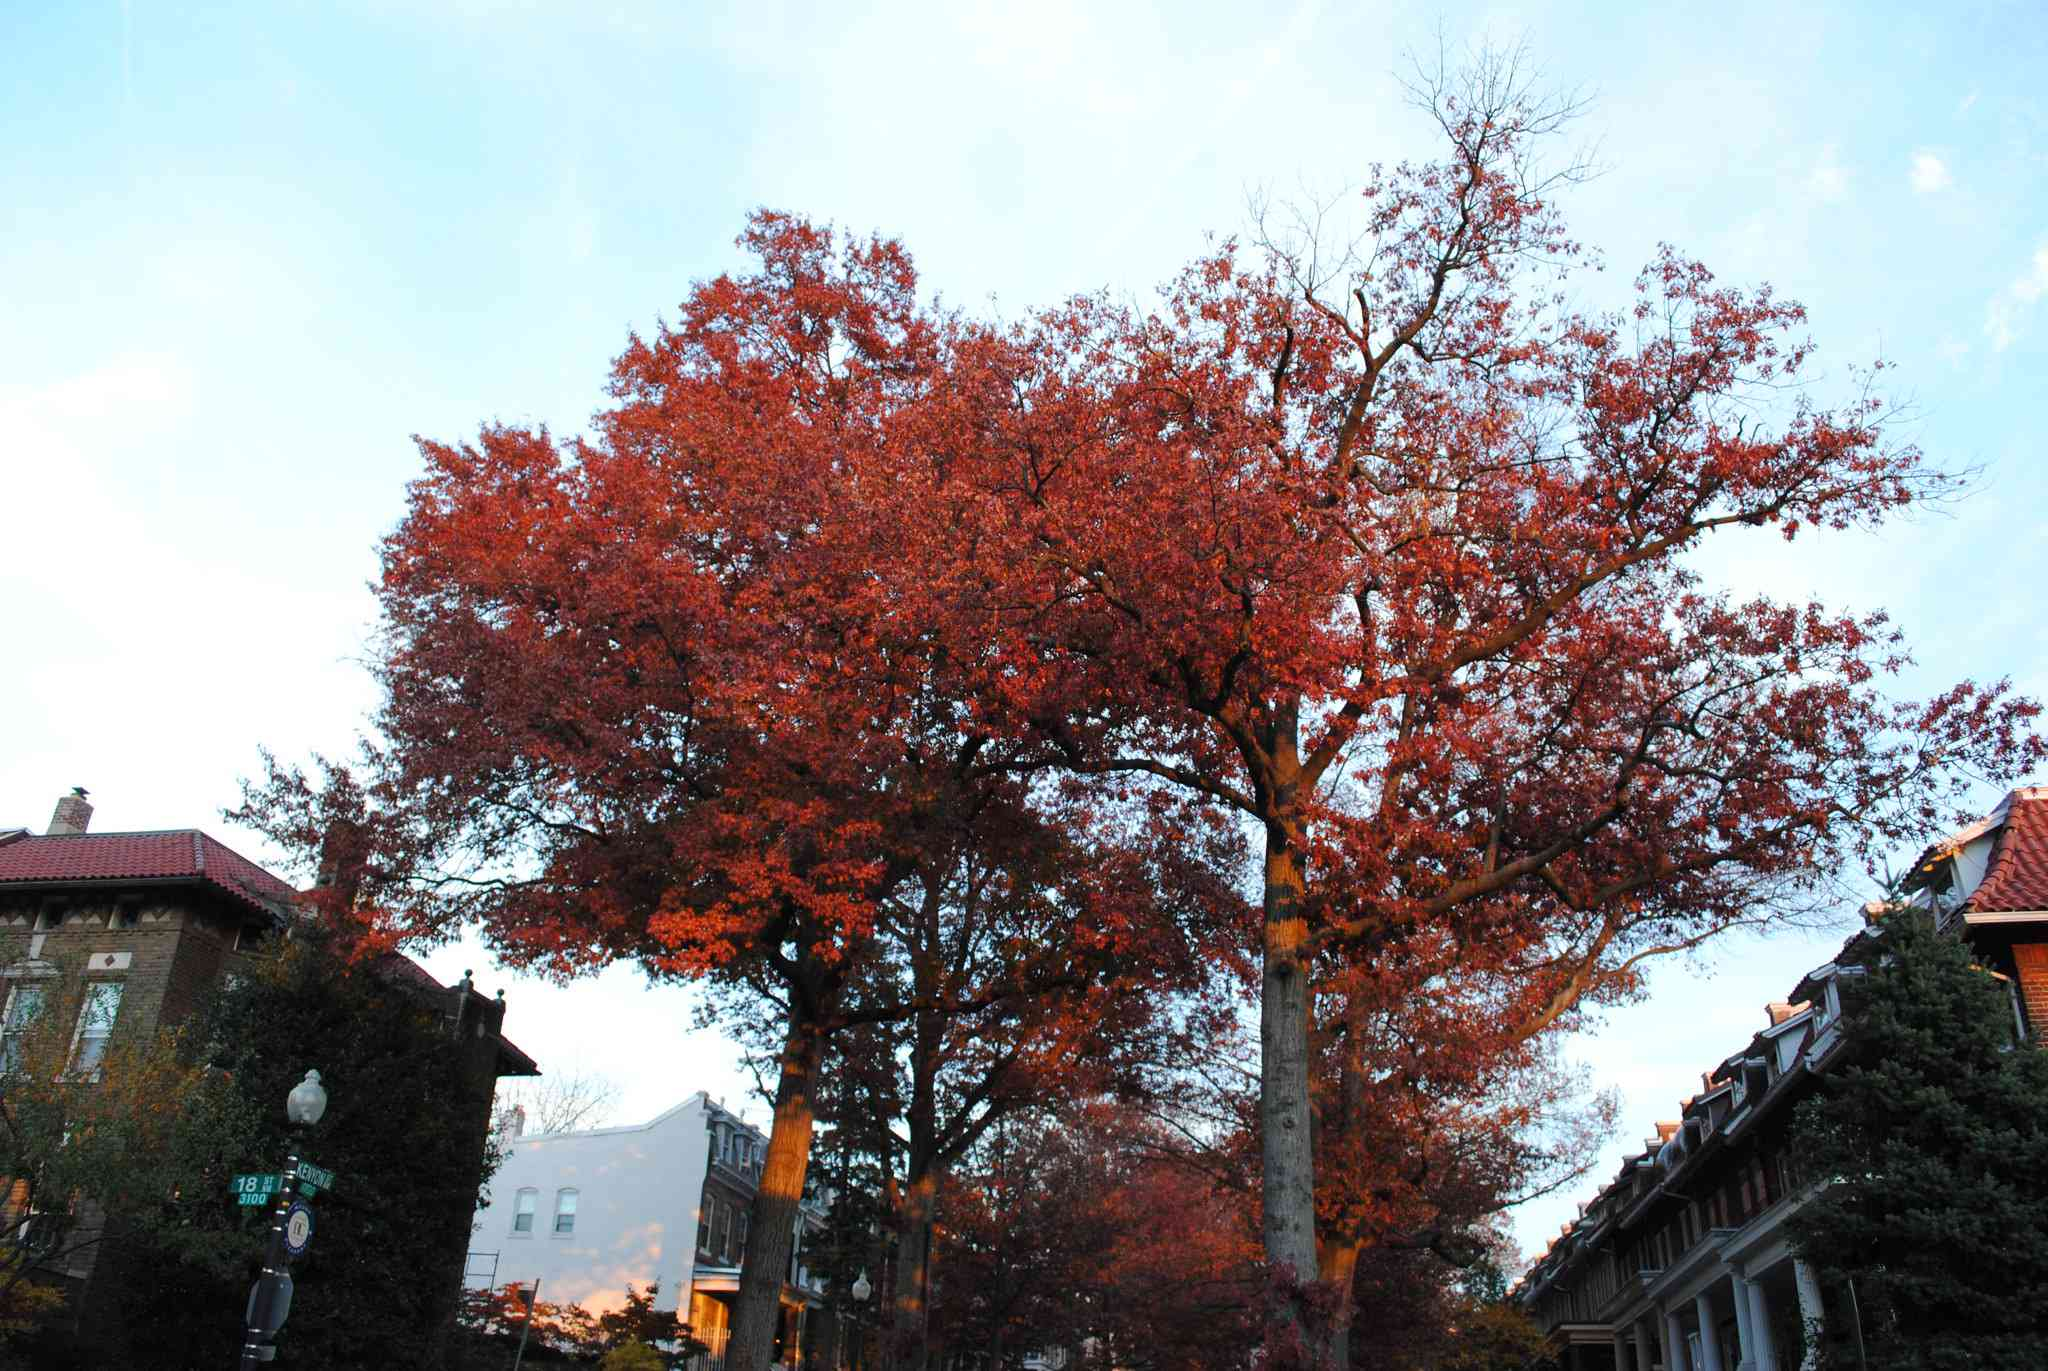 Red leaves on a Pin Oak tree in an urban street setting.